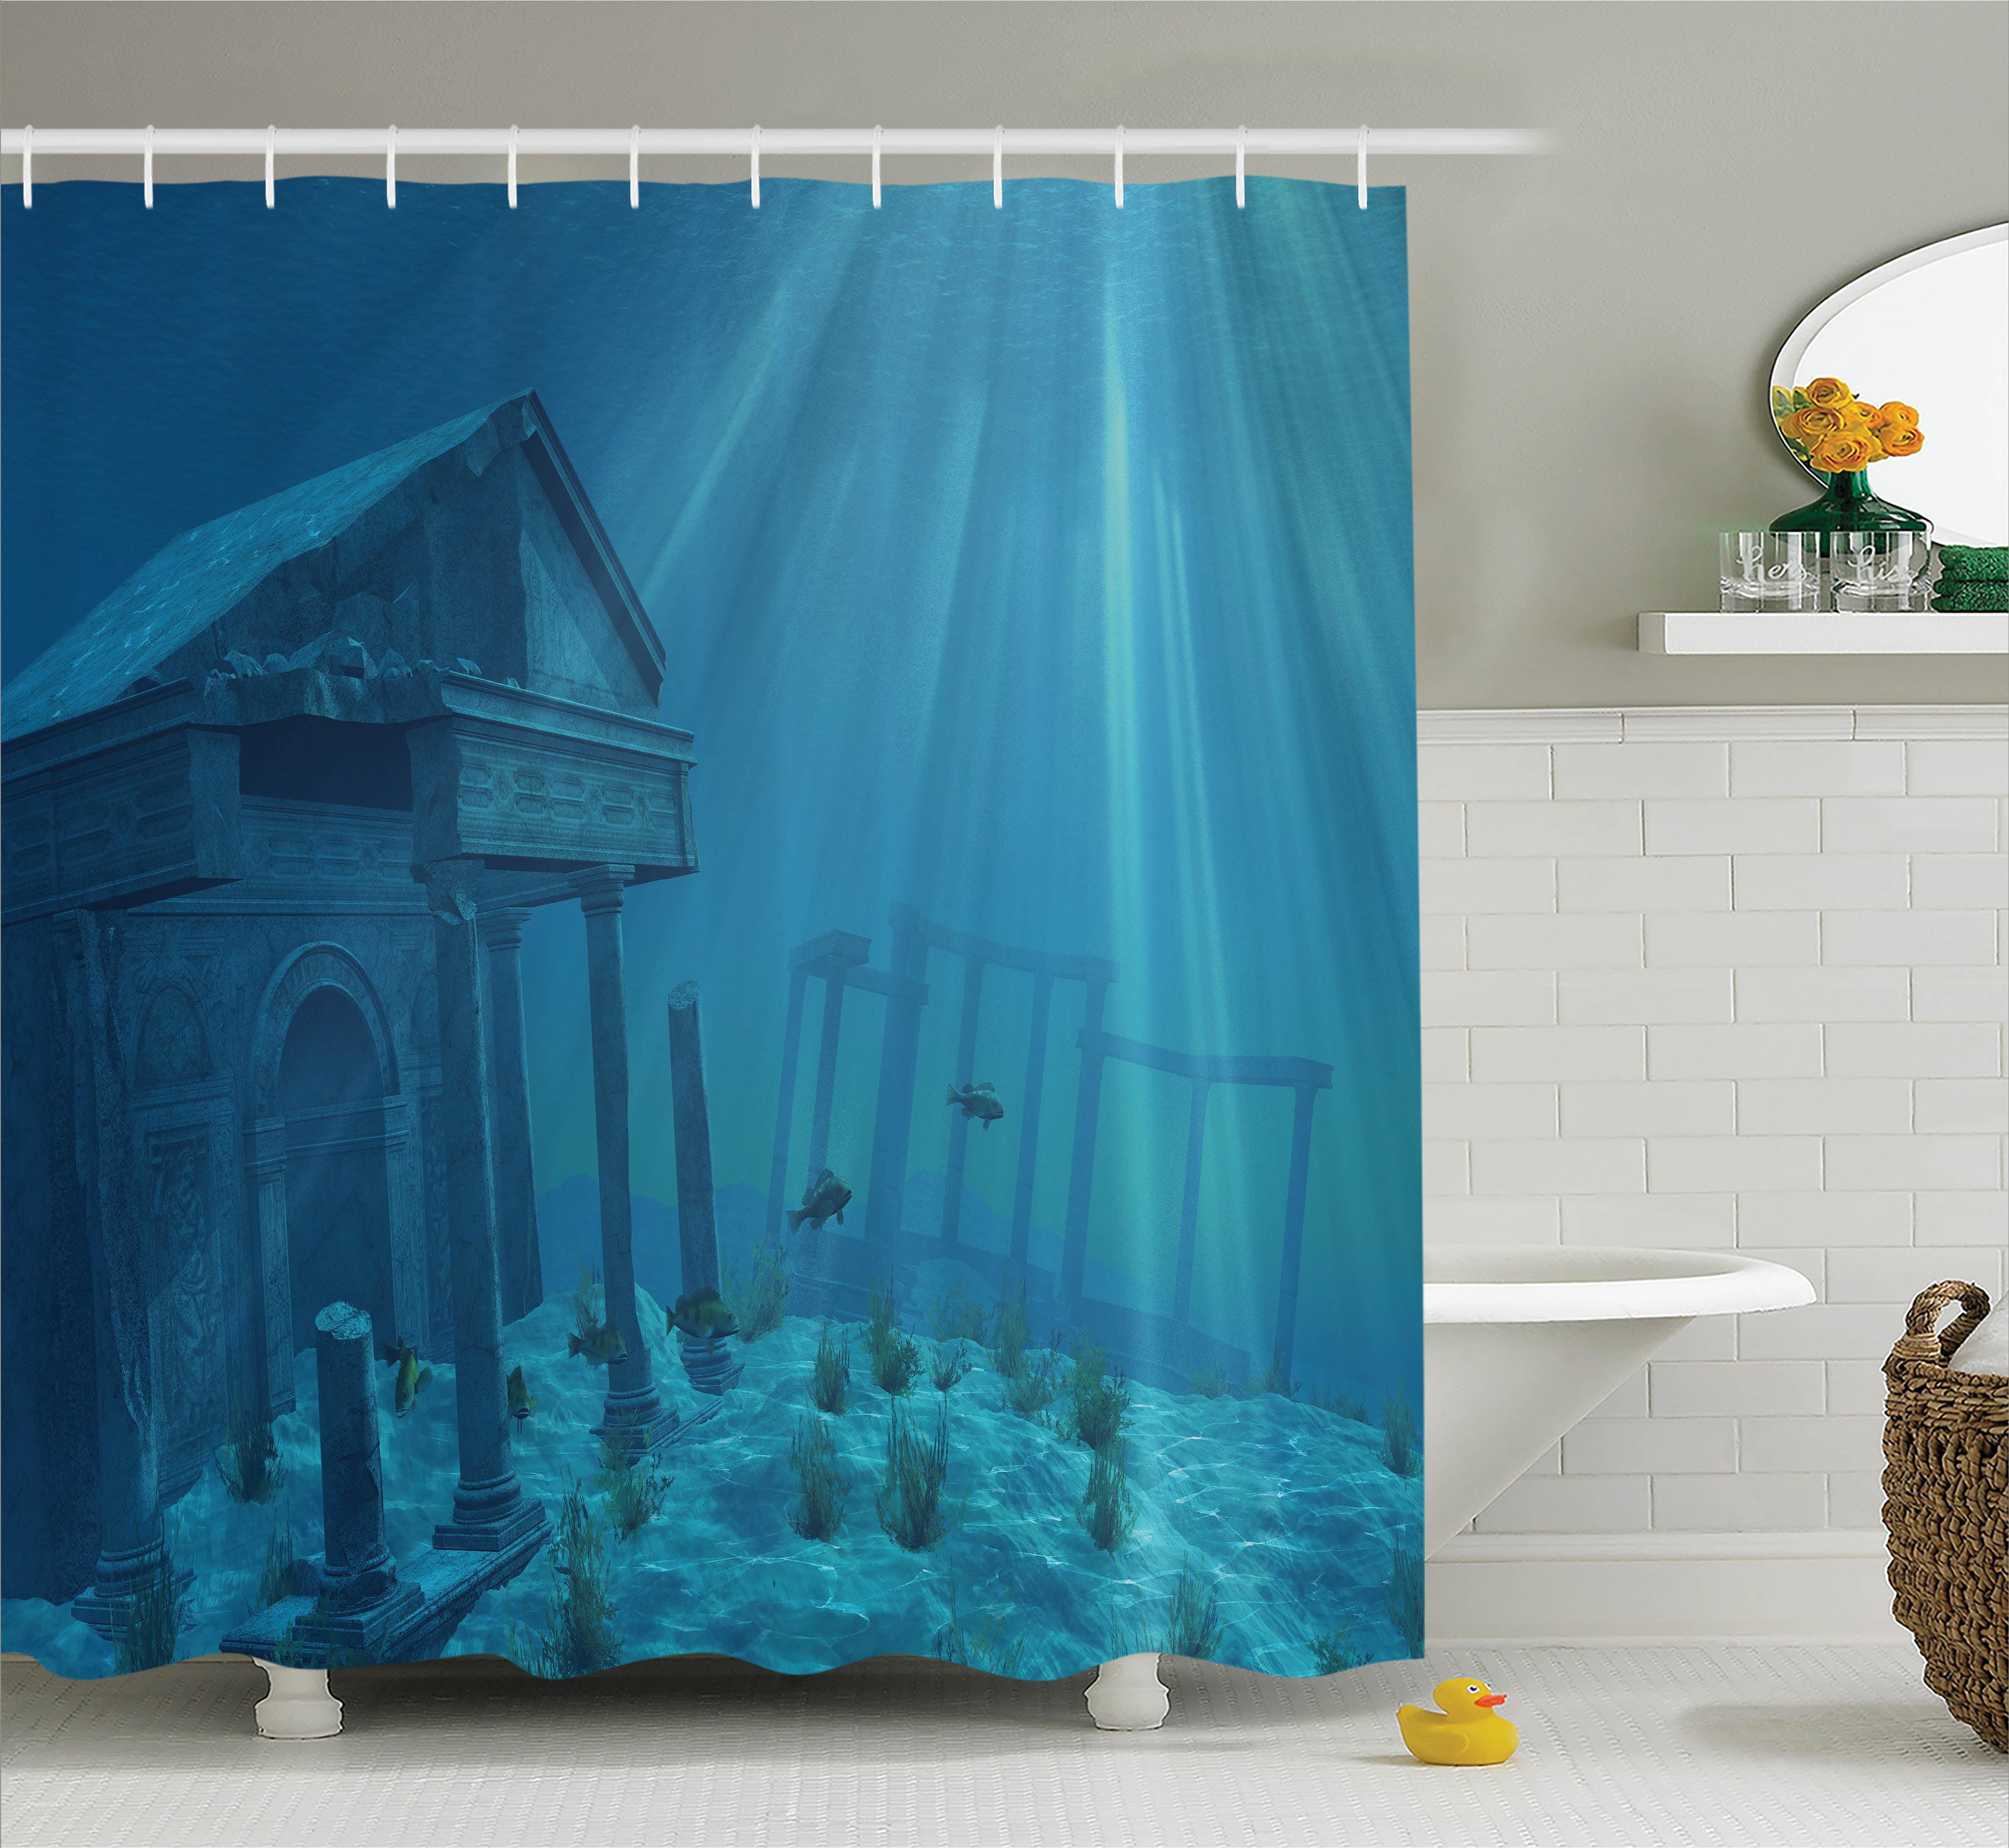 Ocean Life Shower Curtain Set Sunlight Over Ruins Of A Former Civilization Deep Undersea Atlantis World Nautical Picture Print Bathroom Decor Teal